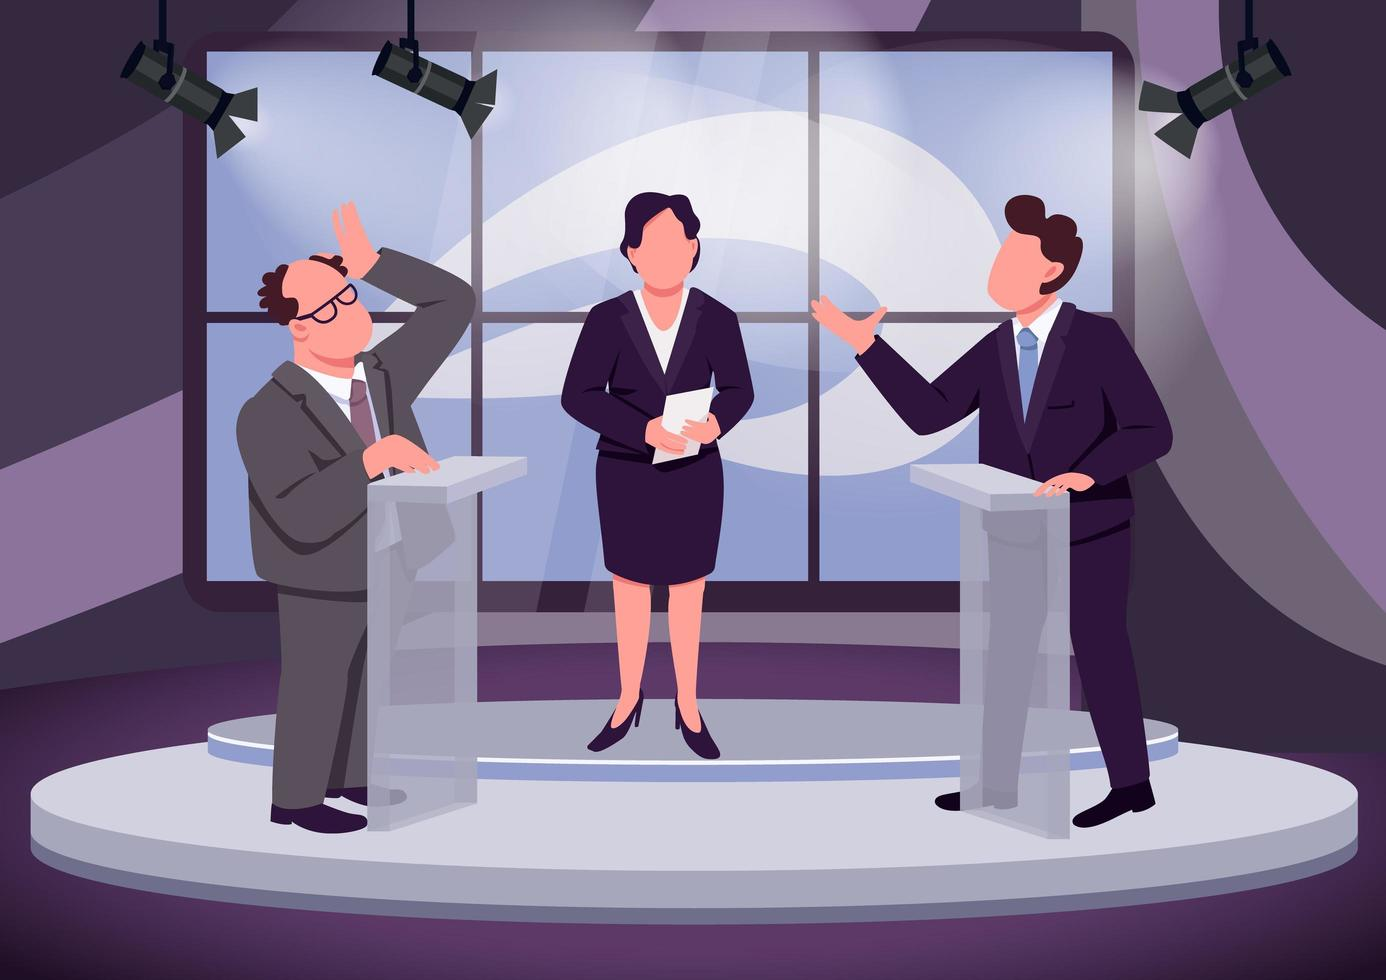 televisie debat scene vector